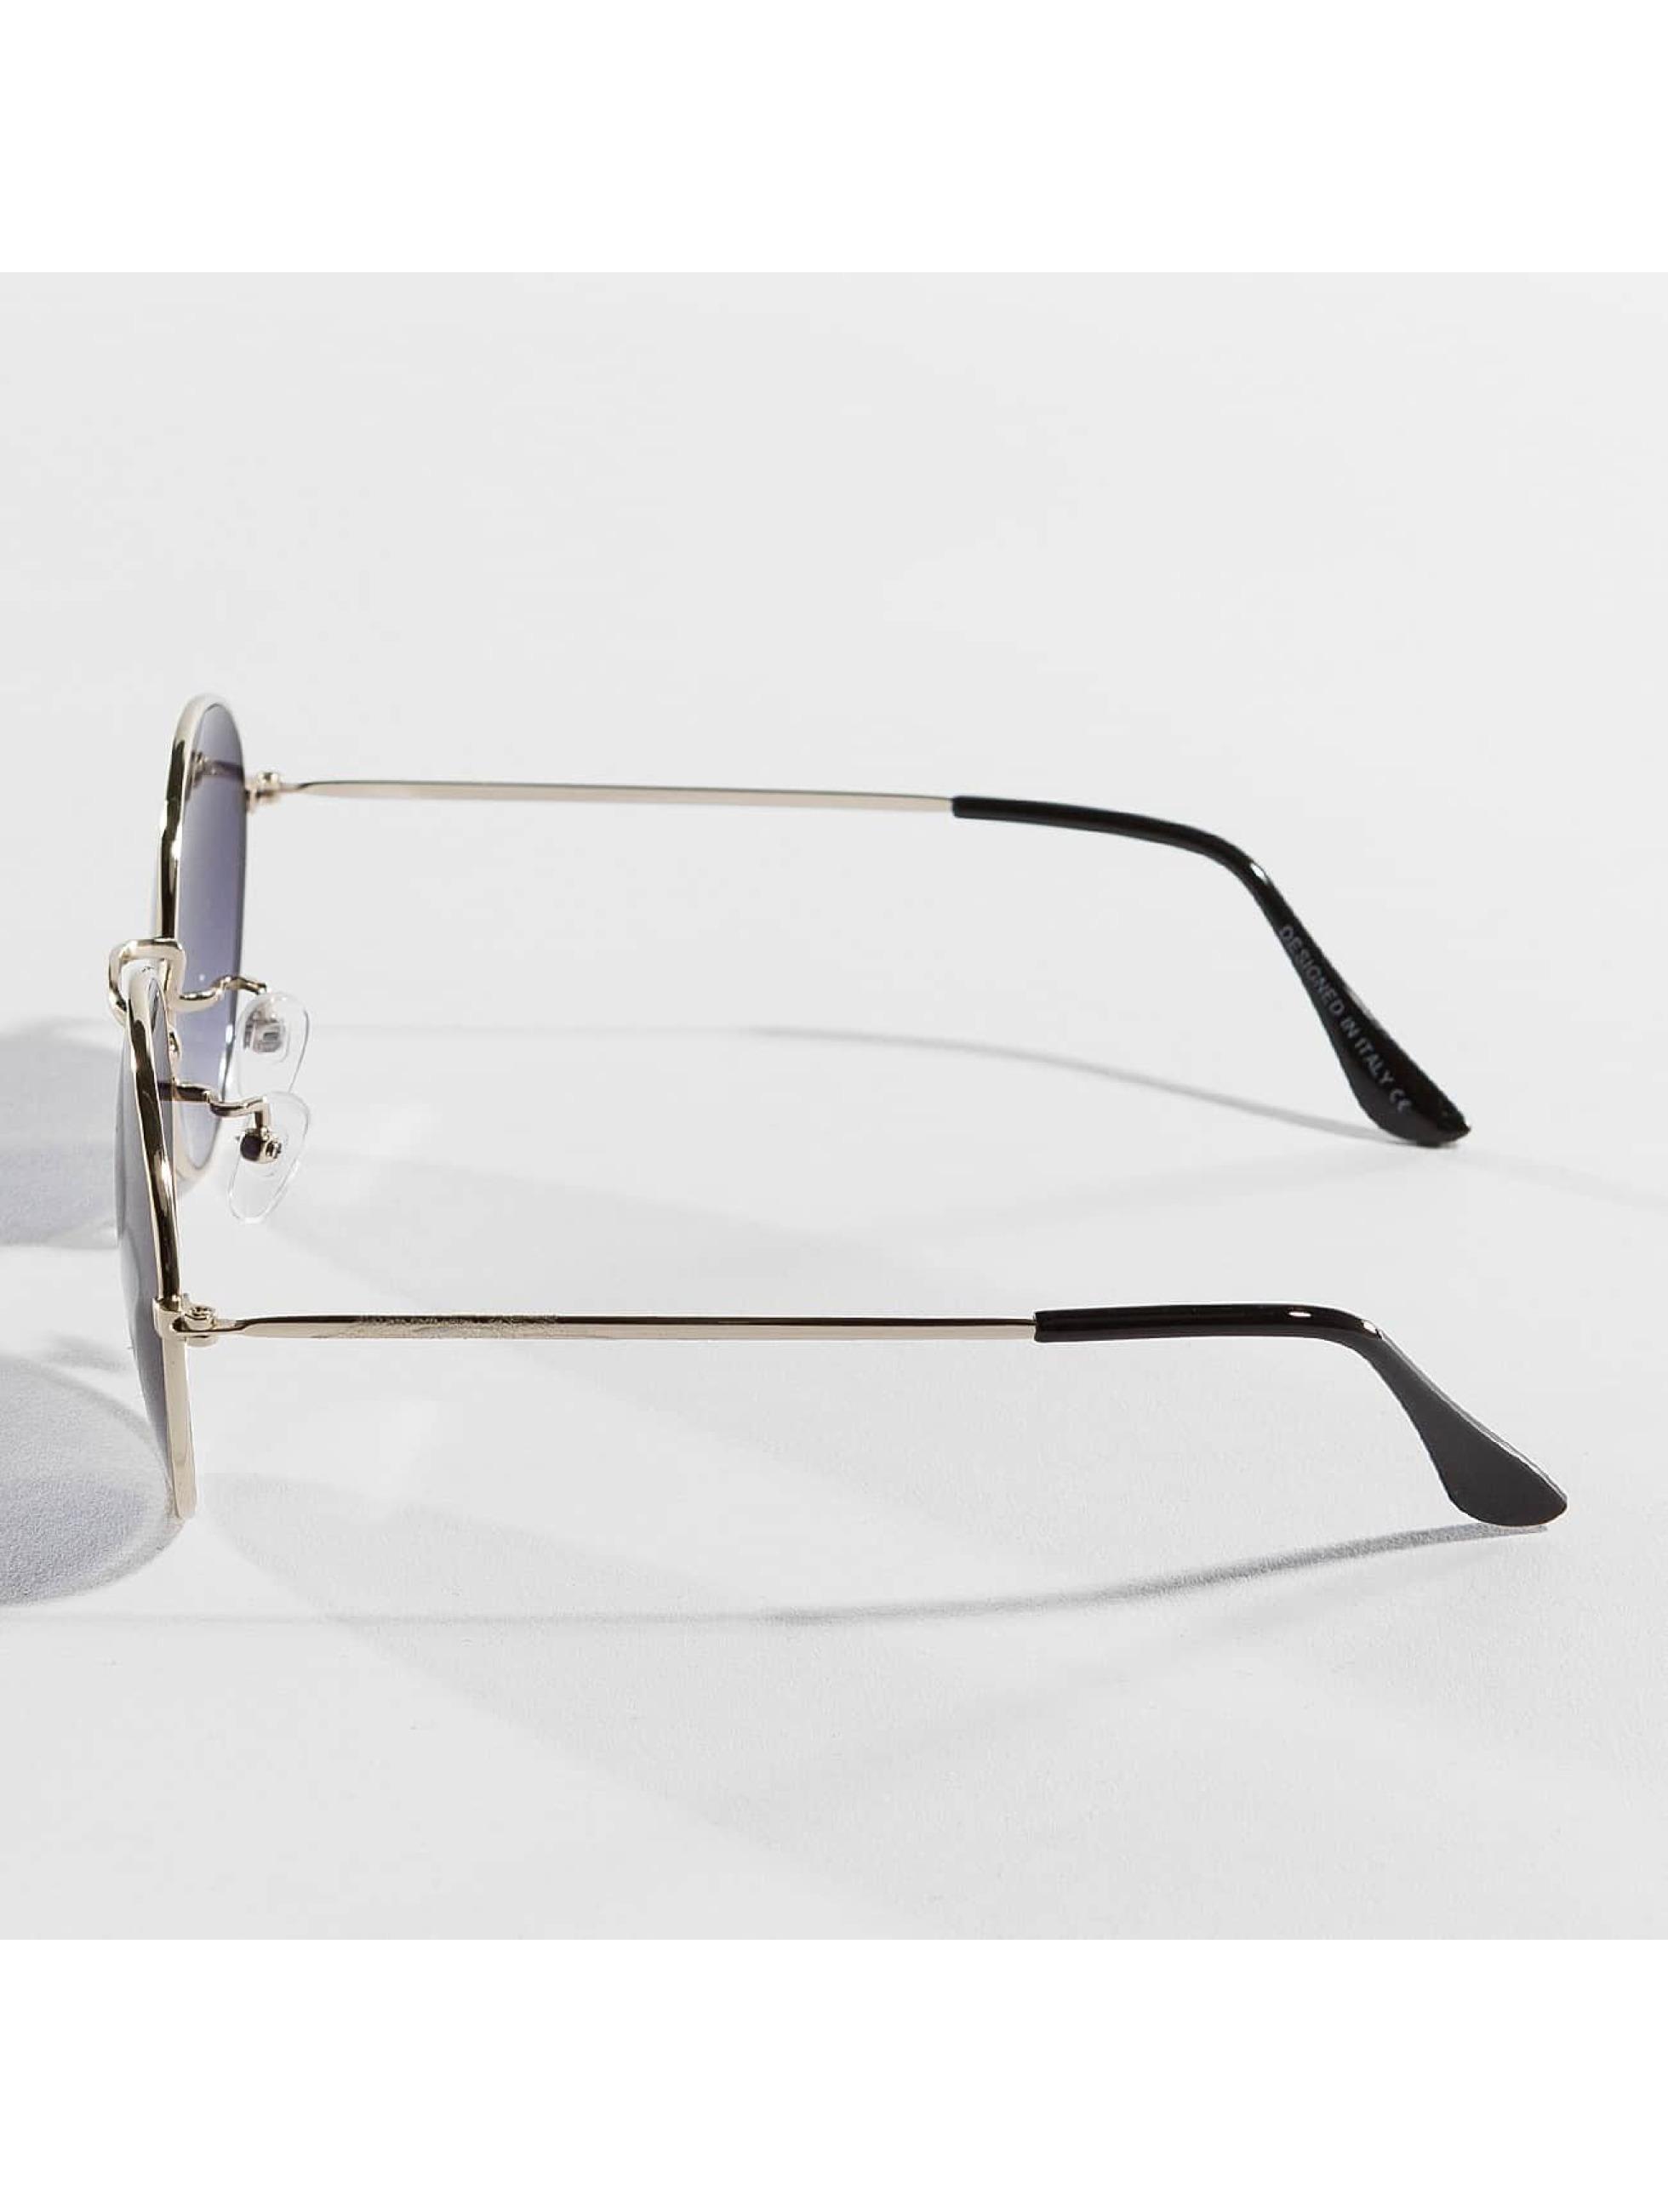 Hailys Sunglasses Rondie gold